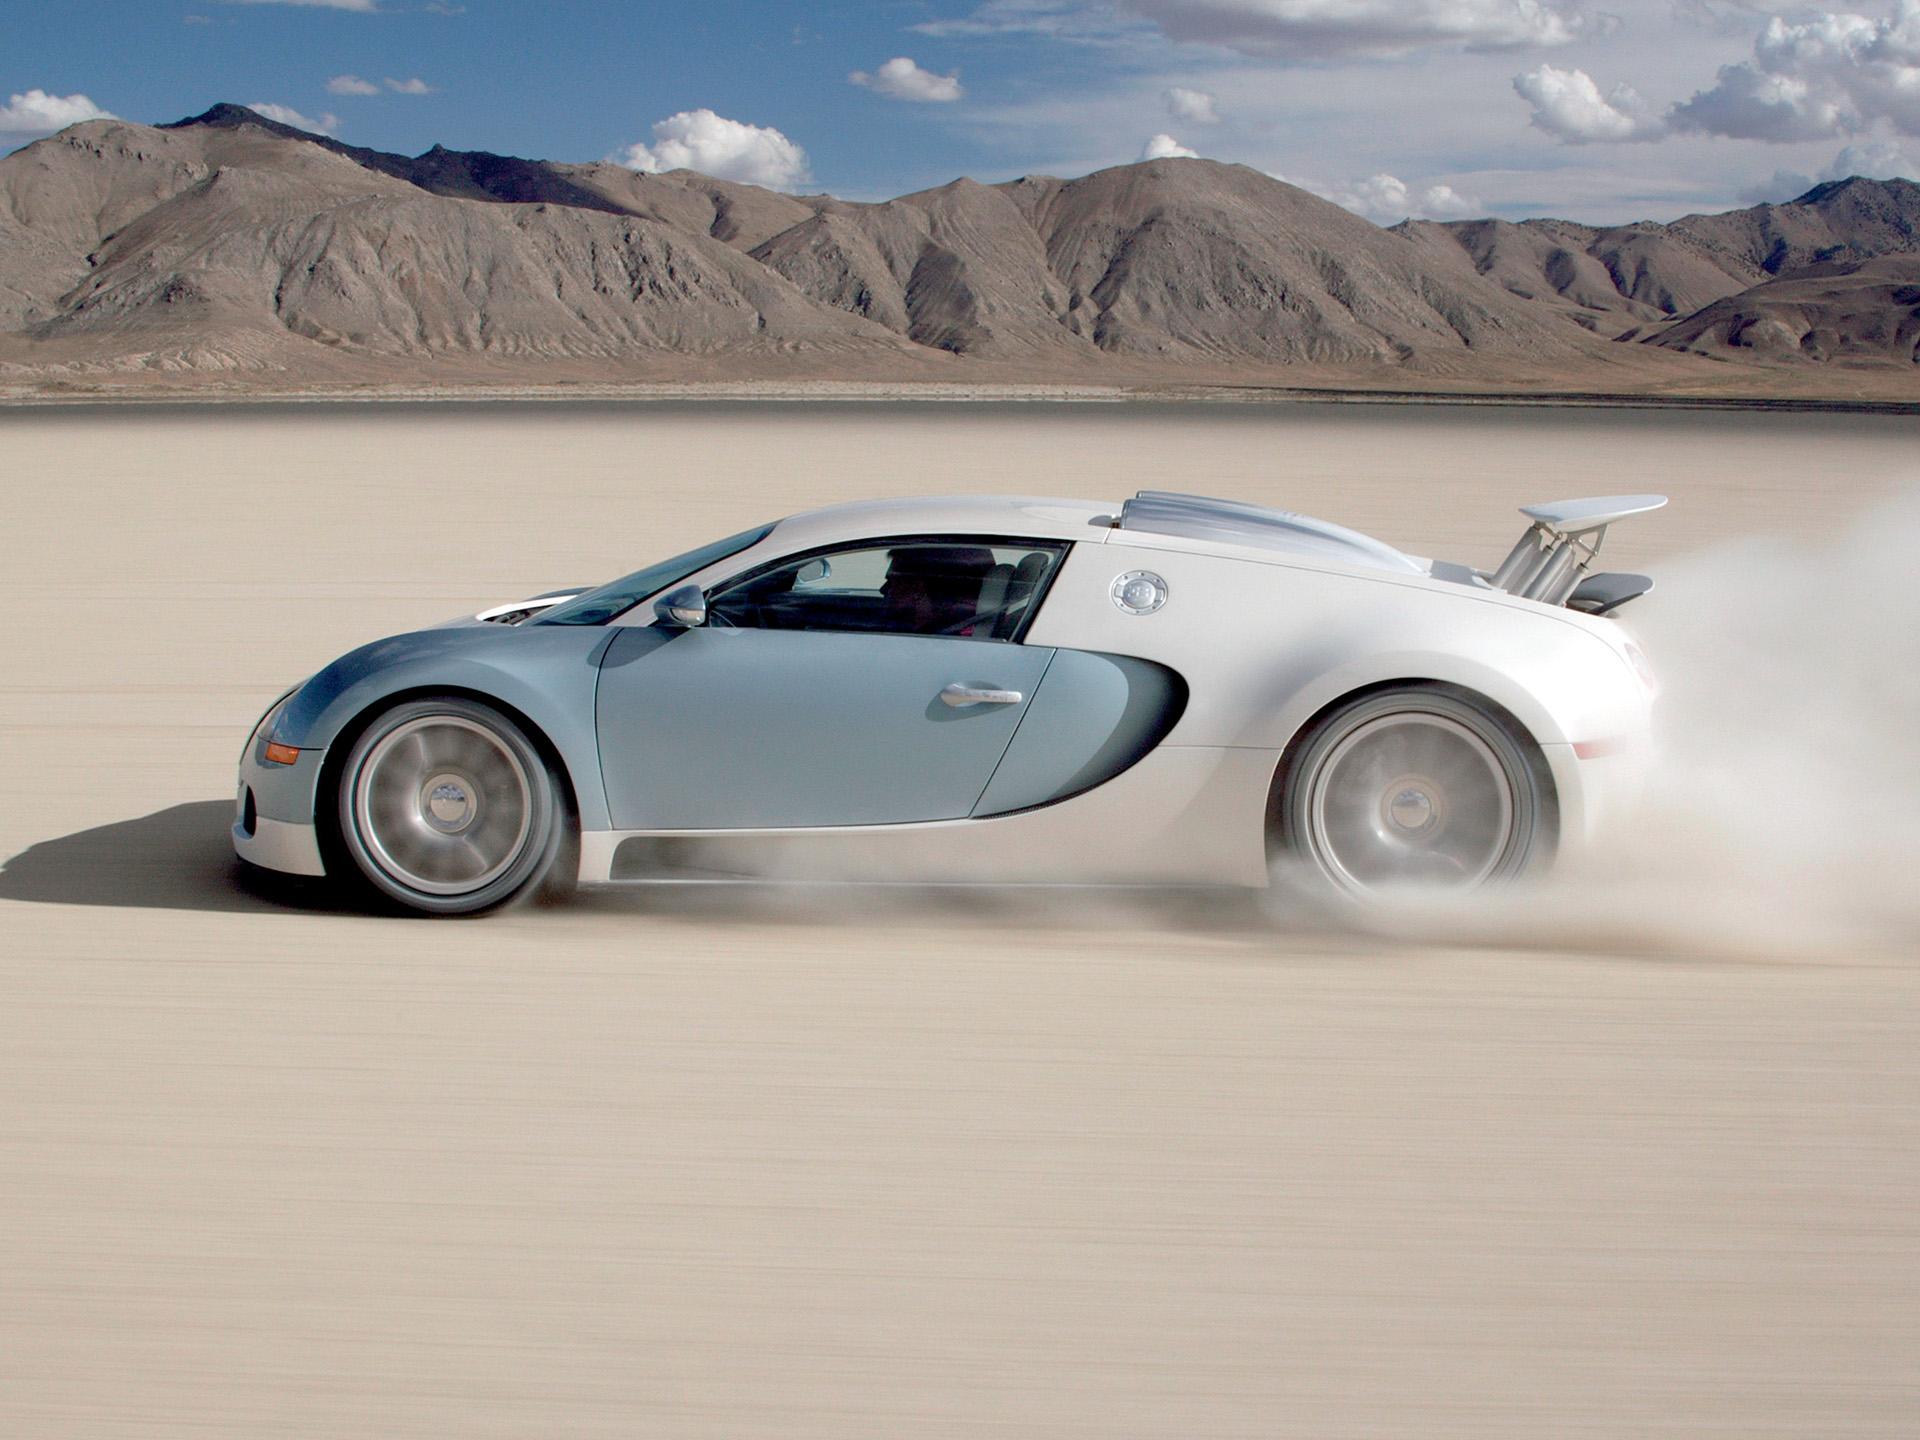 Bugatti Veyron Wallpaper 41